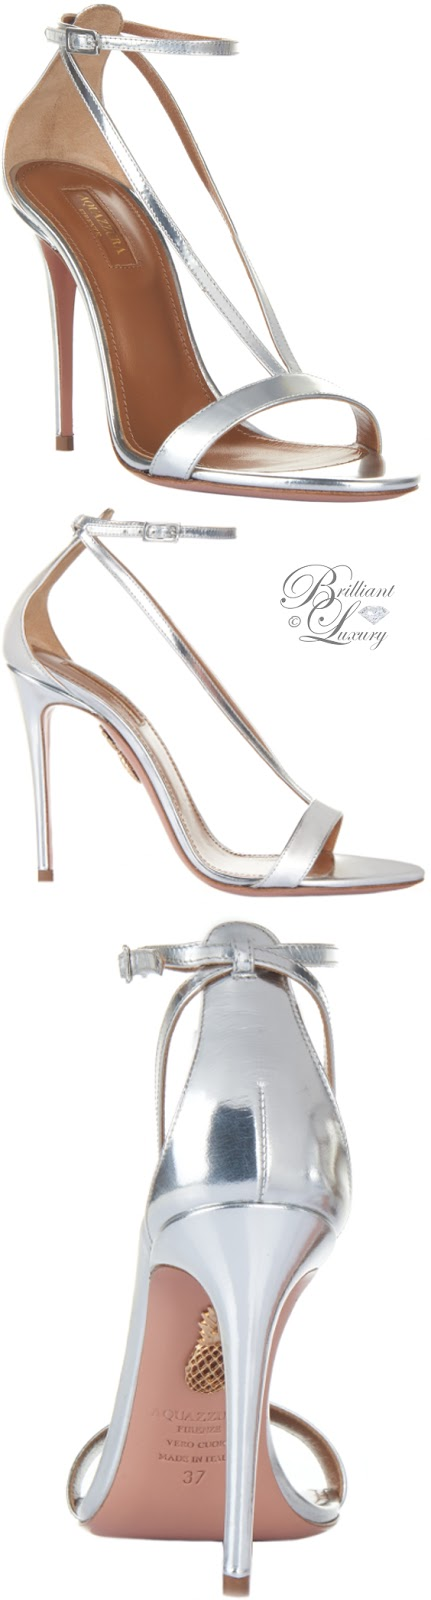 Brilliant Luxury ♦ Aquazzura Casanova Sandals